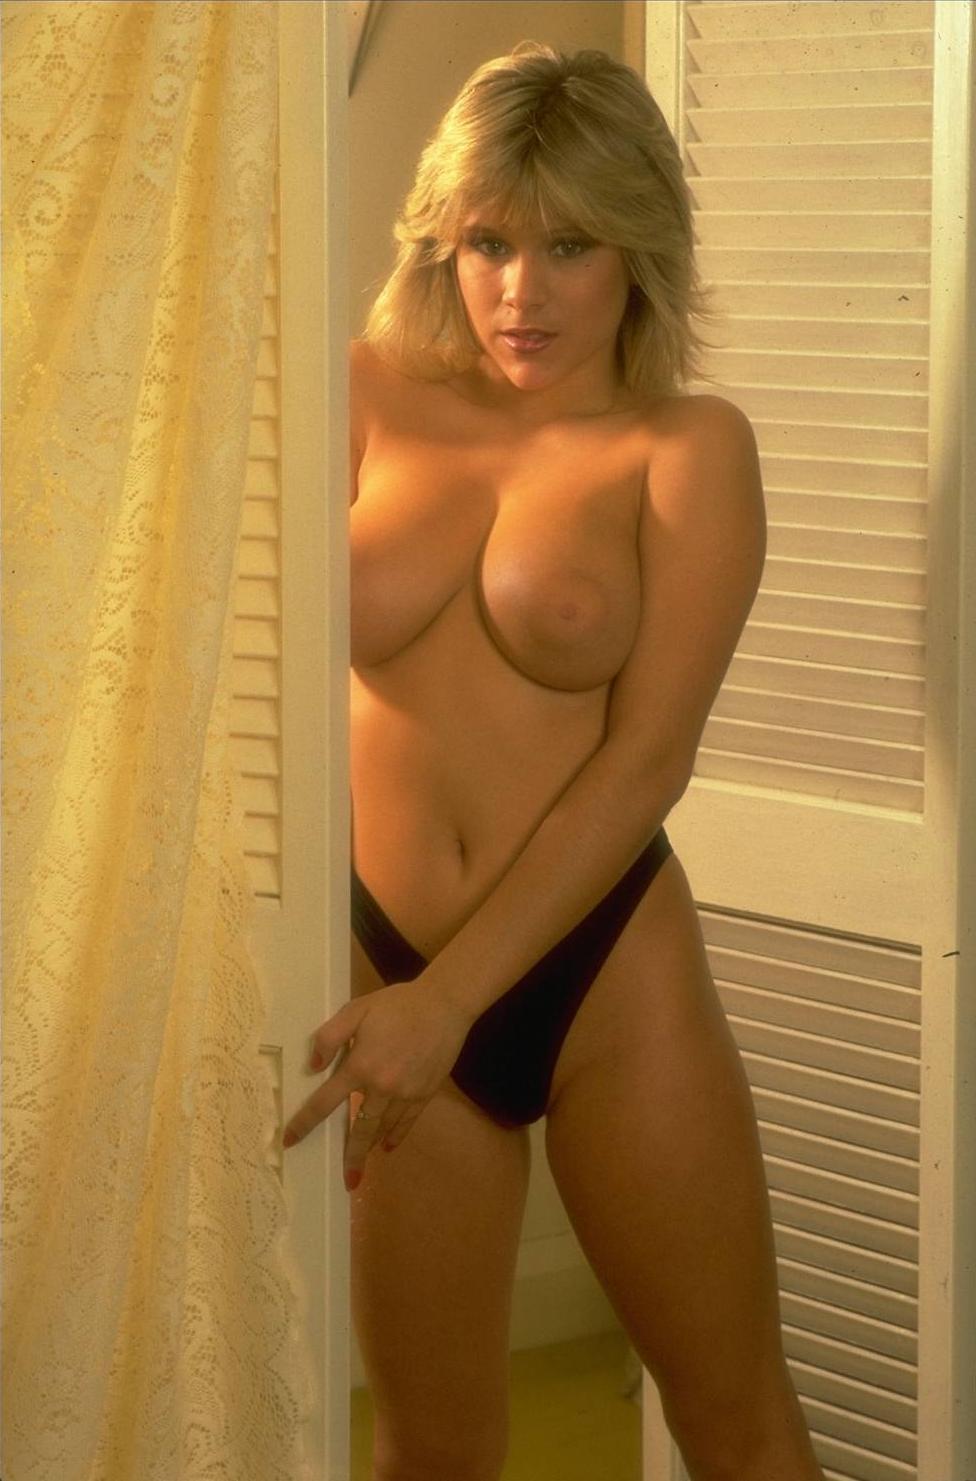 http://1.bp.blogspot.com/-xPe_zvYKOn4/T4undjuRCDI/AAAAAAAADzM/hiqC4n2QMjQ/s1600/Samantha+Fox78.jpg